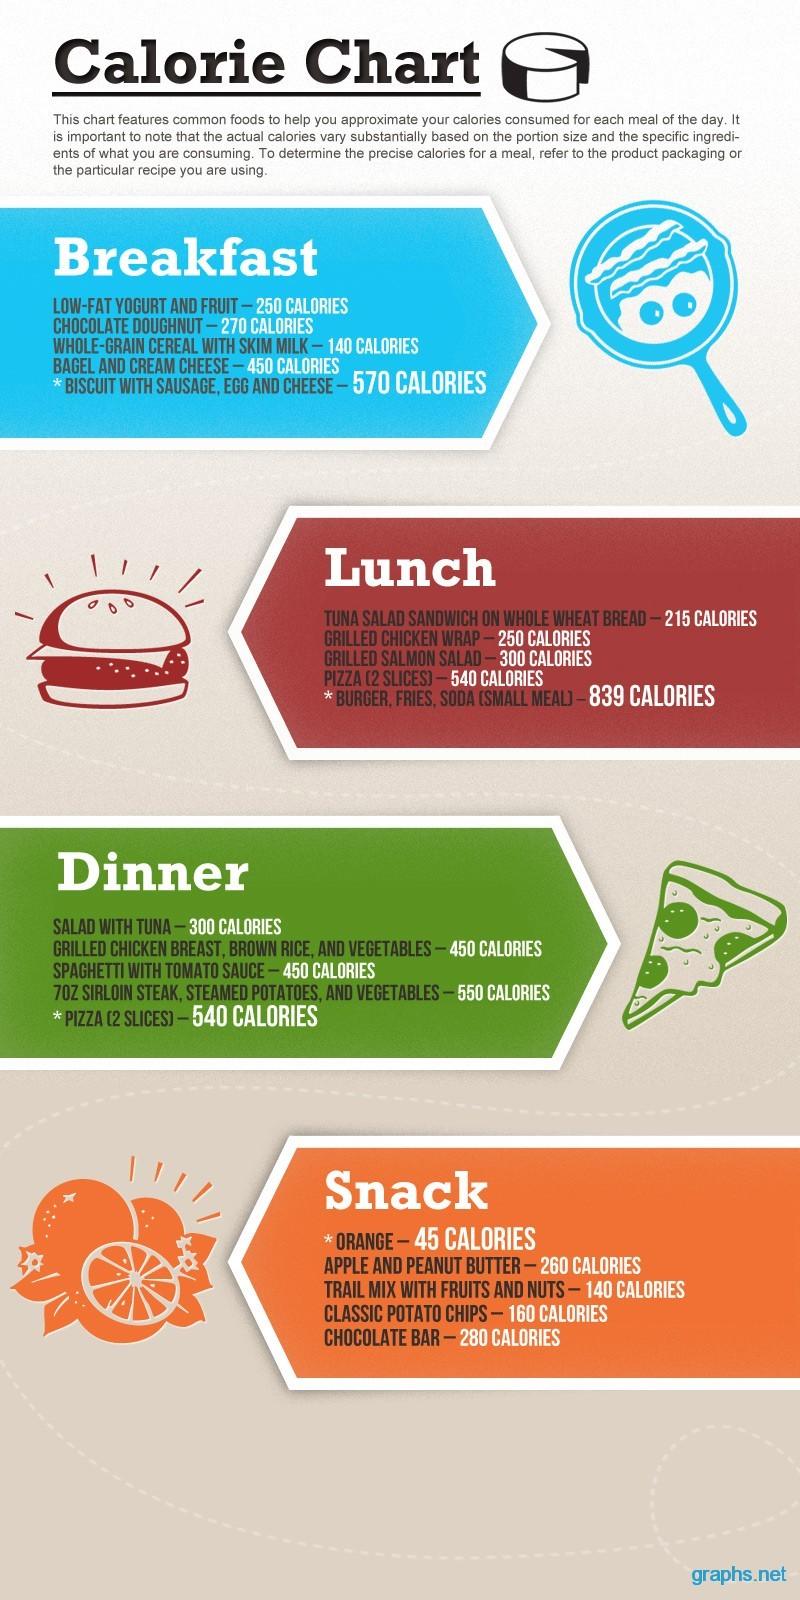 Calories In Halloween Candy Fun Size Treats: Calories Fact Sheet (InfoGraphic) - Infographics